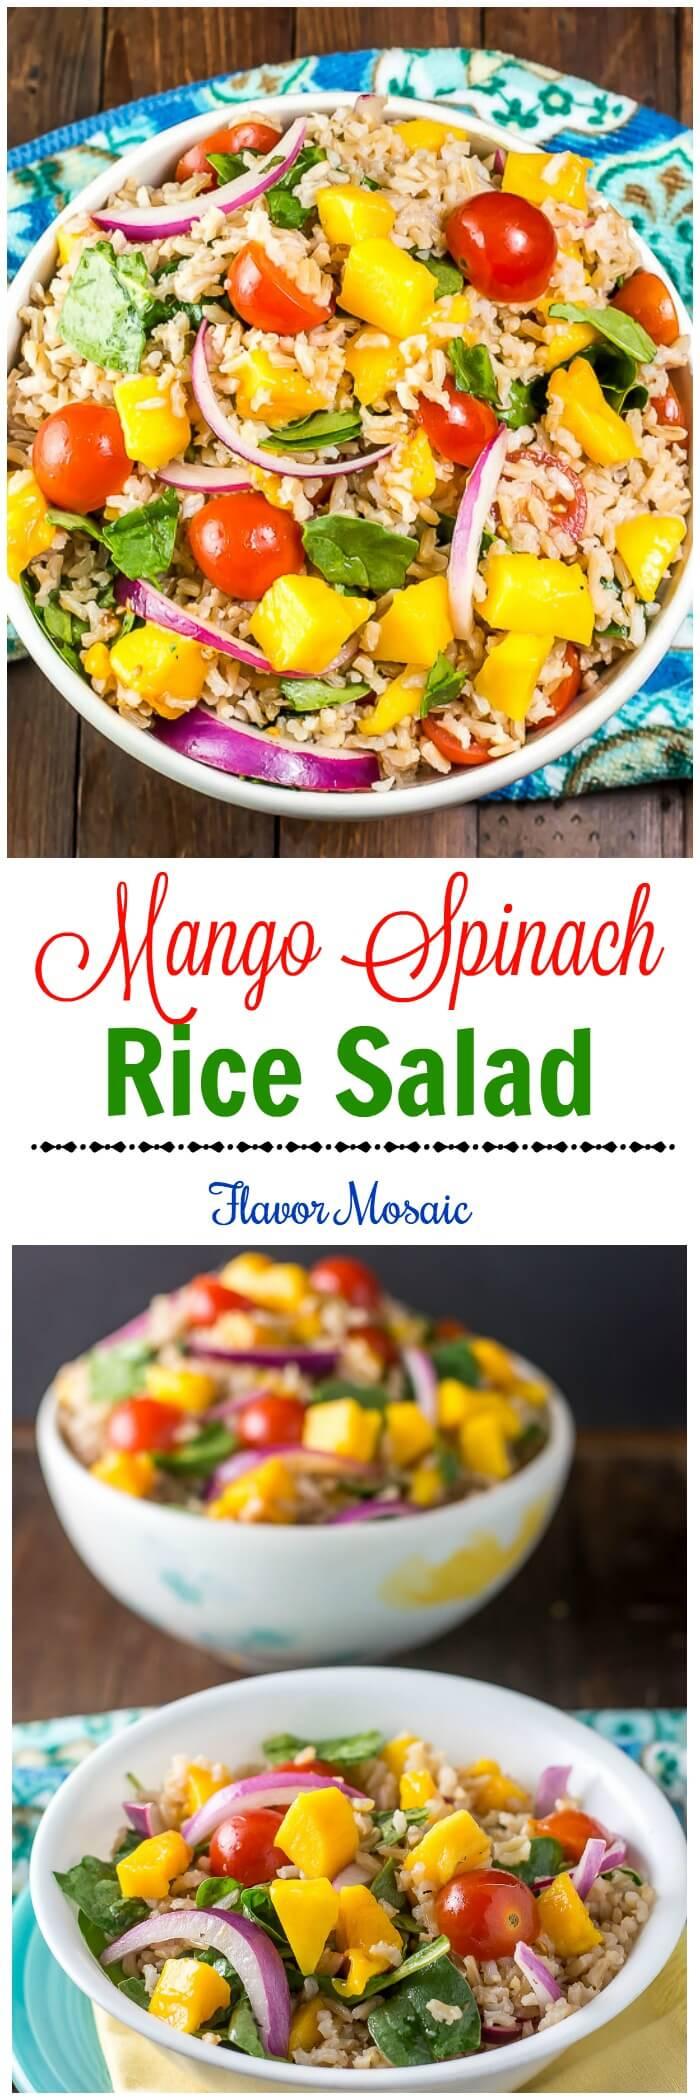 Mango Spinach Rice Salad - Flavor Mosaic